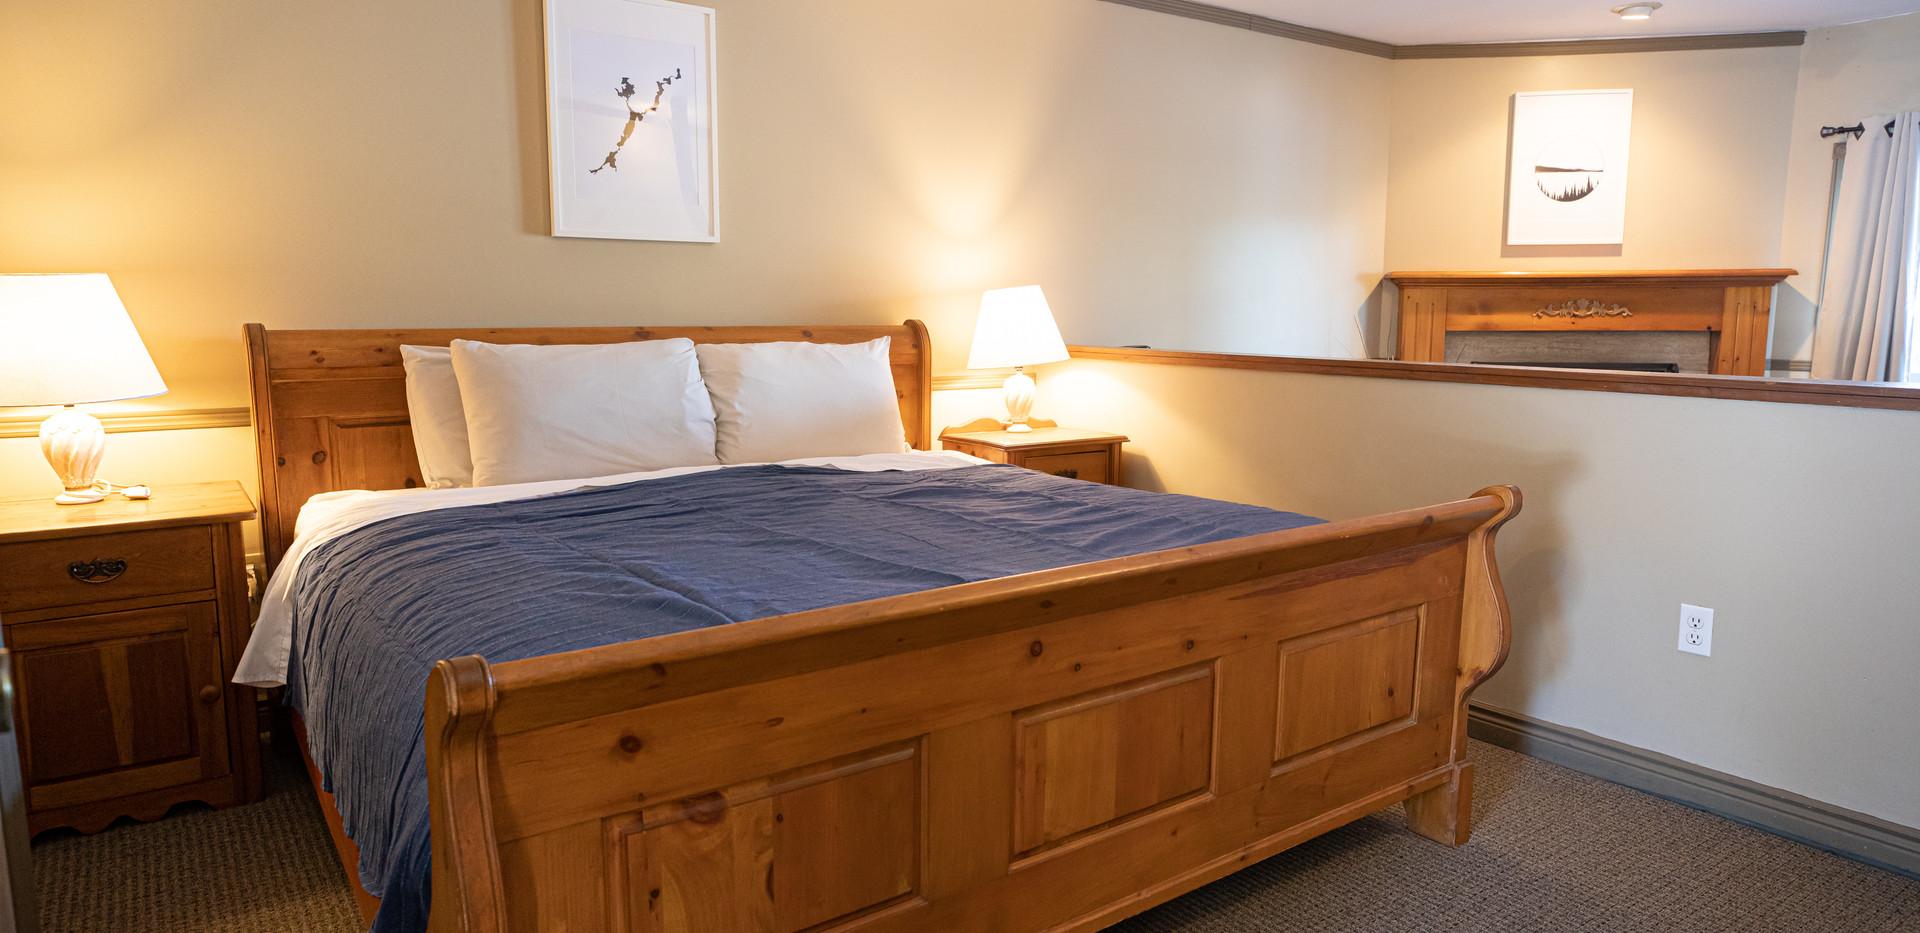 King Suite at the Bonnie View Inn